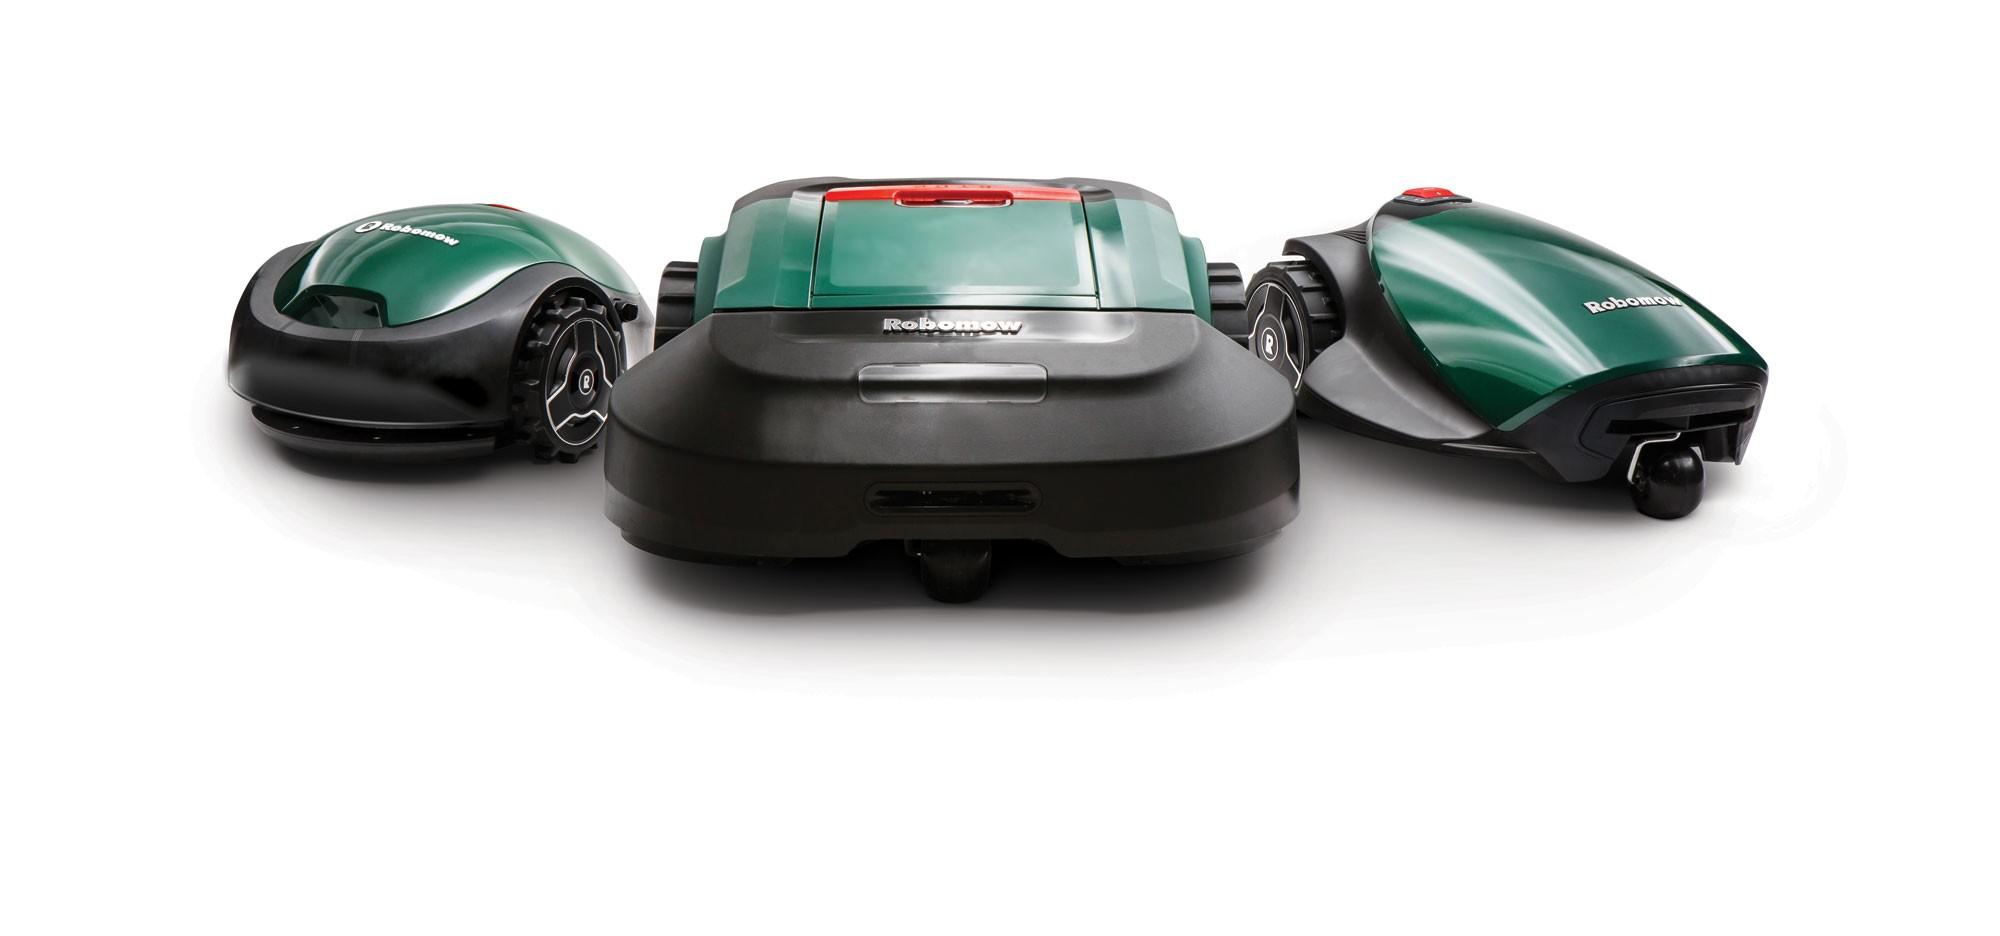 Robomow Mähroboter / Rasenroboter RC Stylish 304u SB 28cm Bild 2